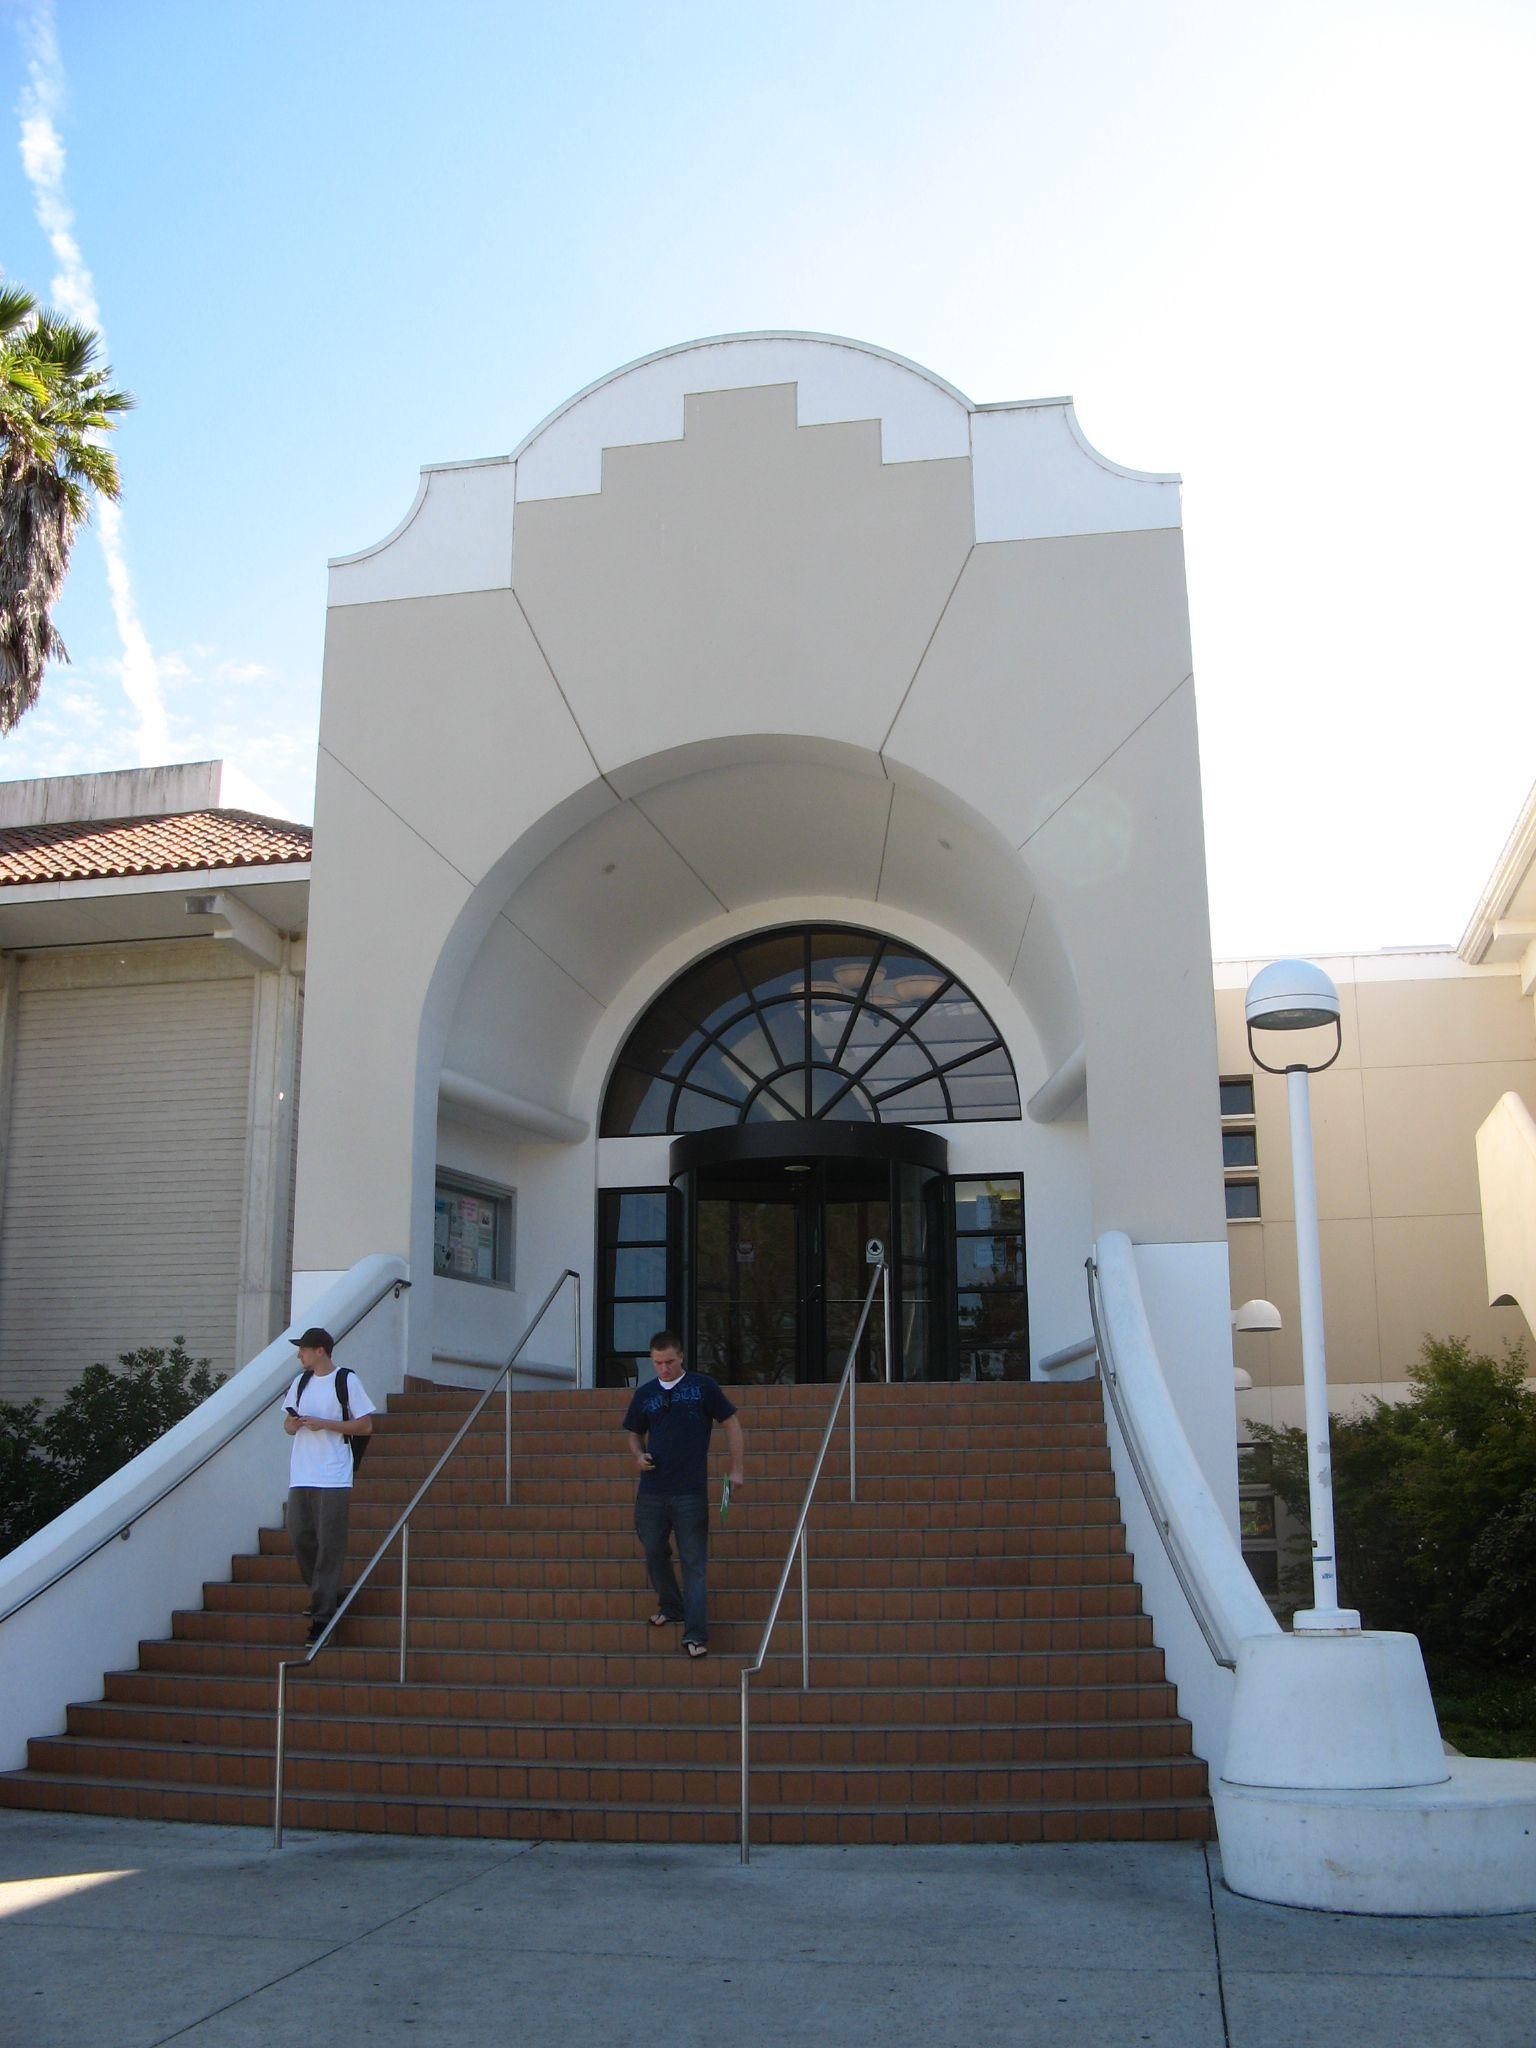 Cuesta College Dorms